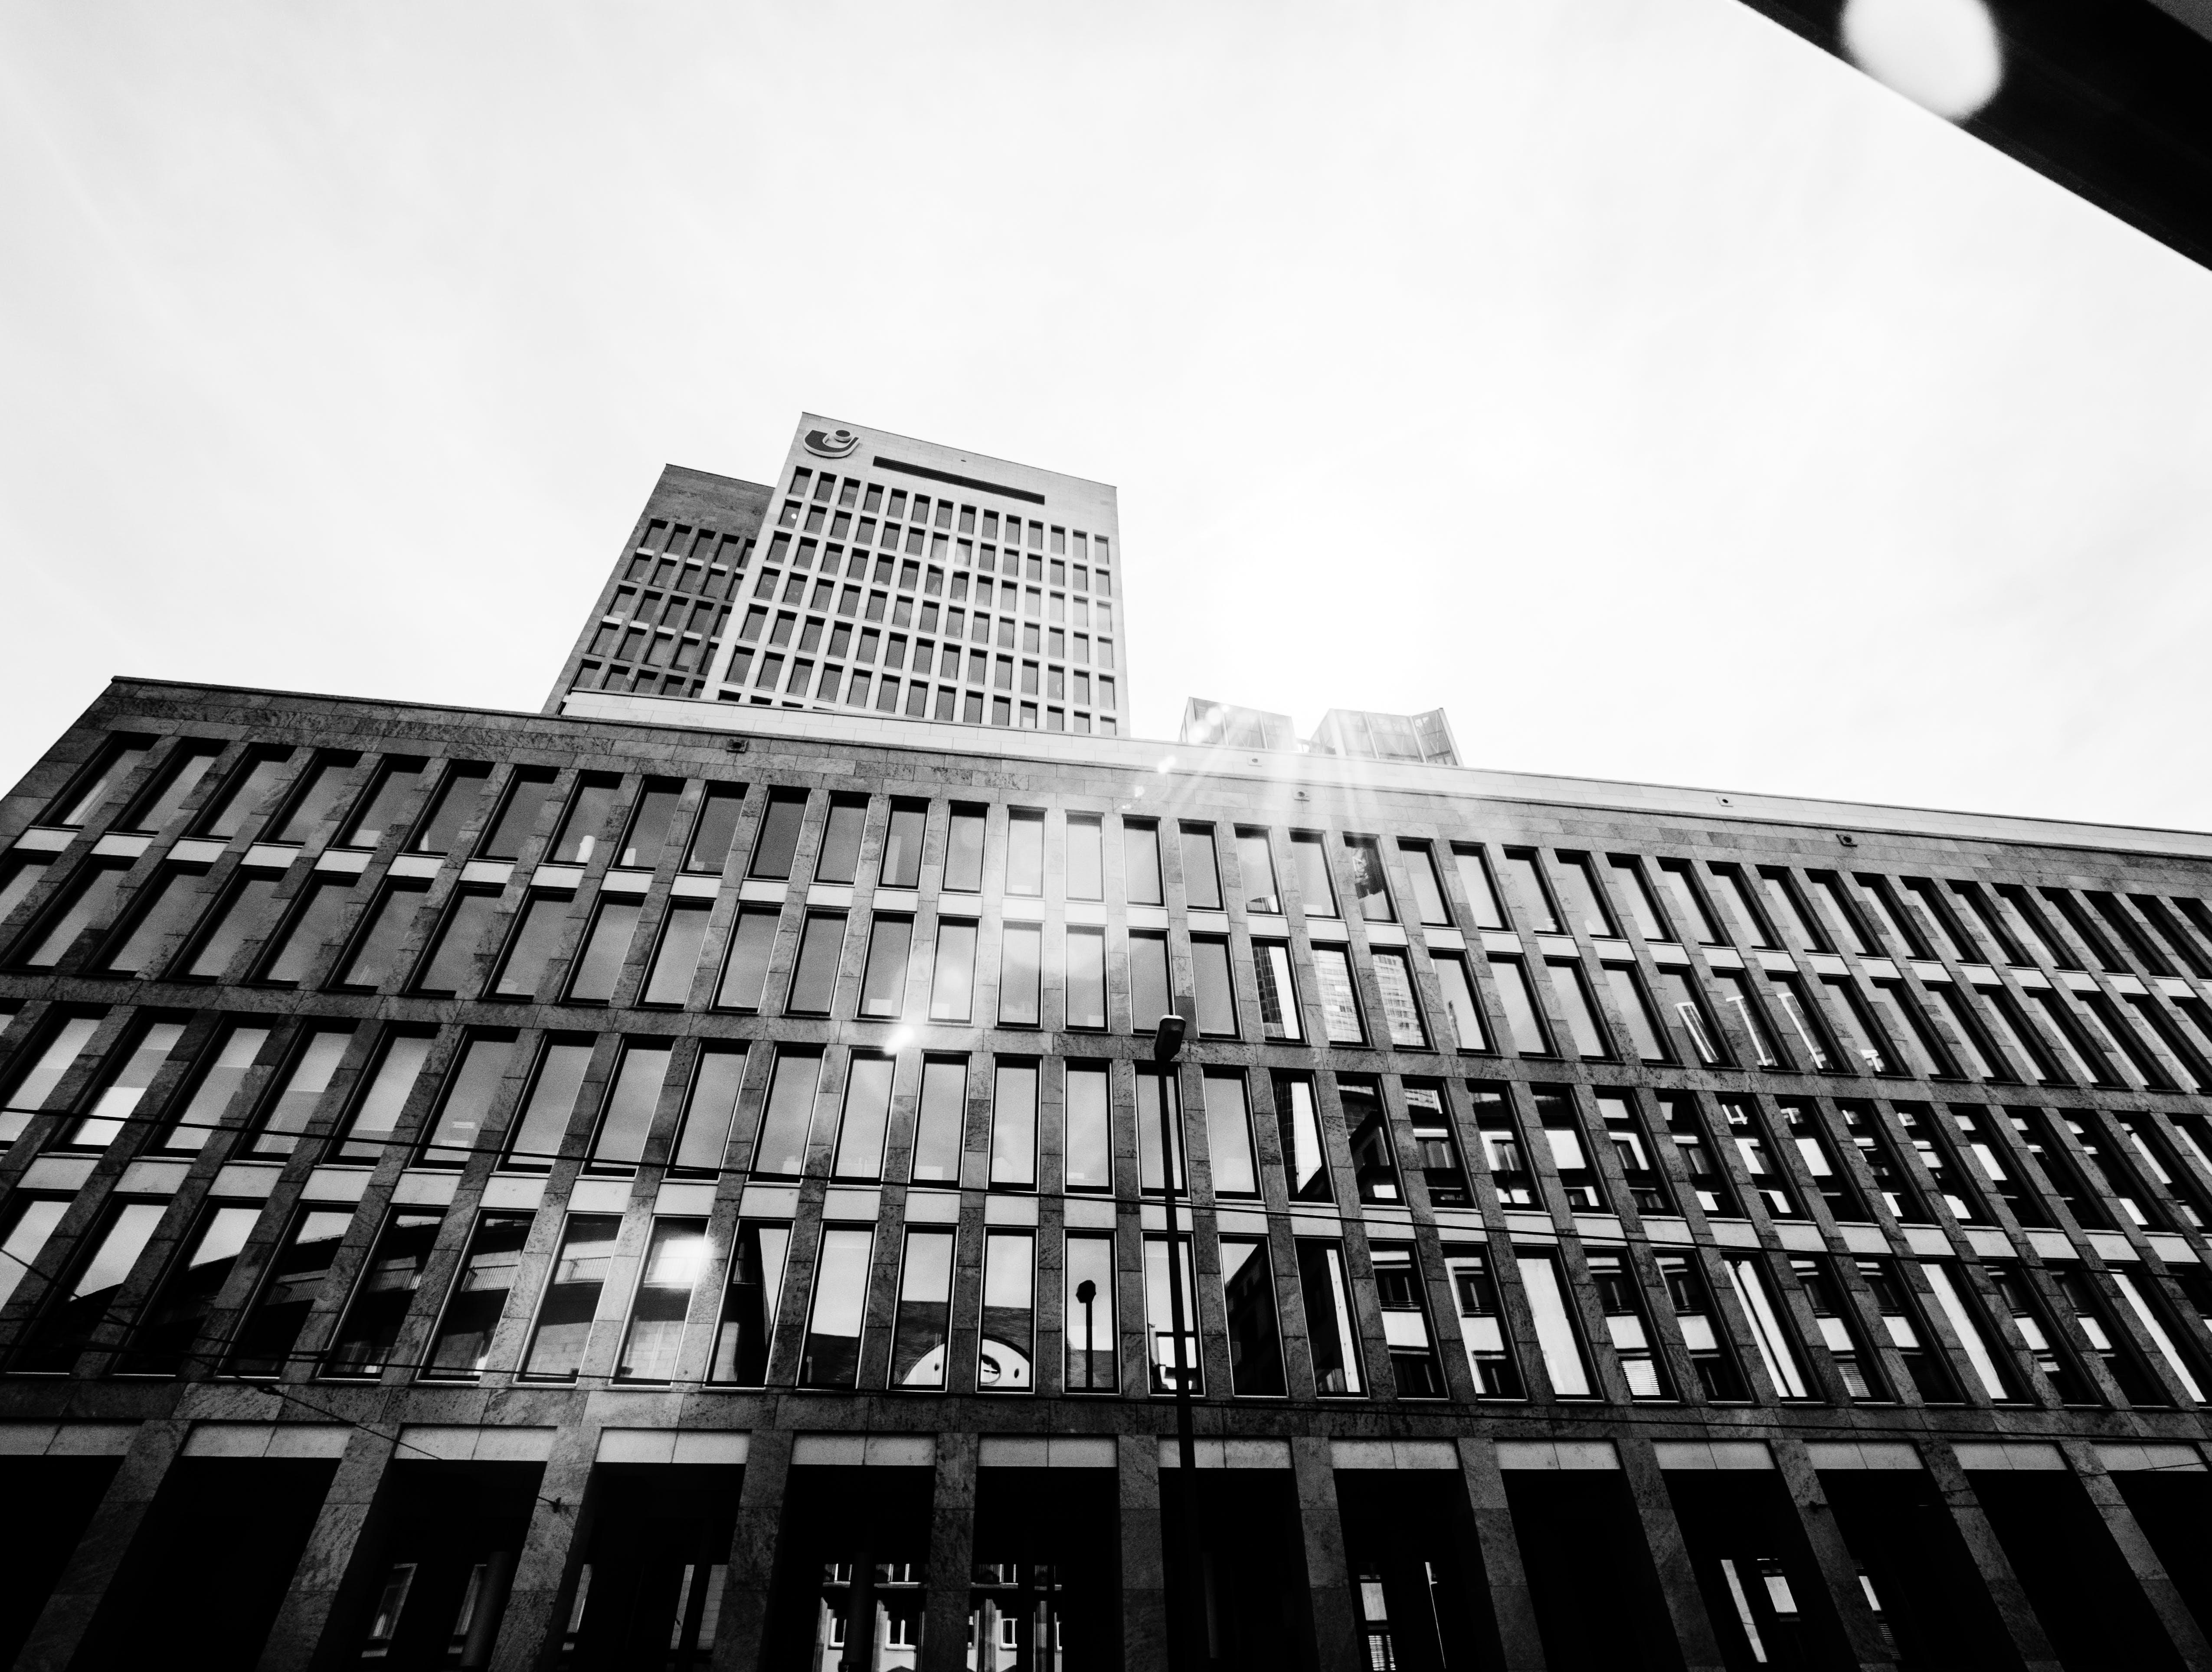 Free stock photo of sunshine, building, lens flare, windows